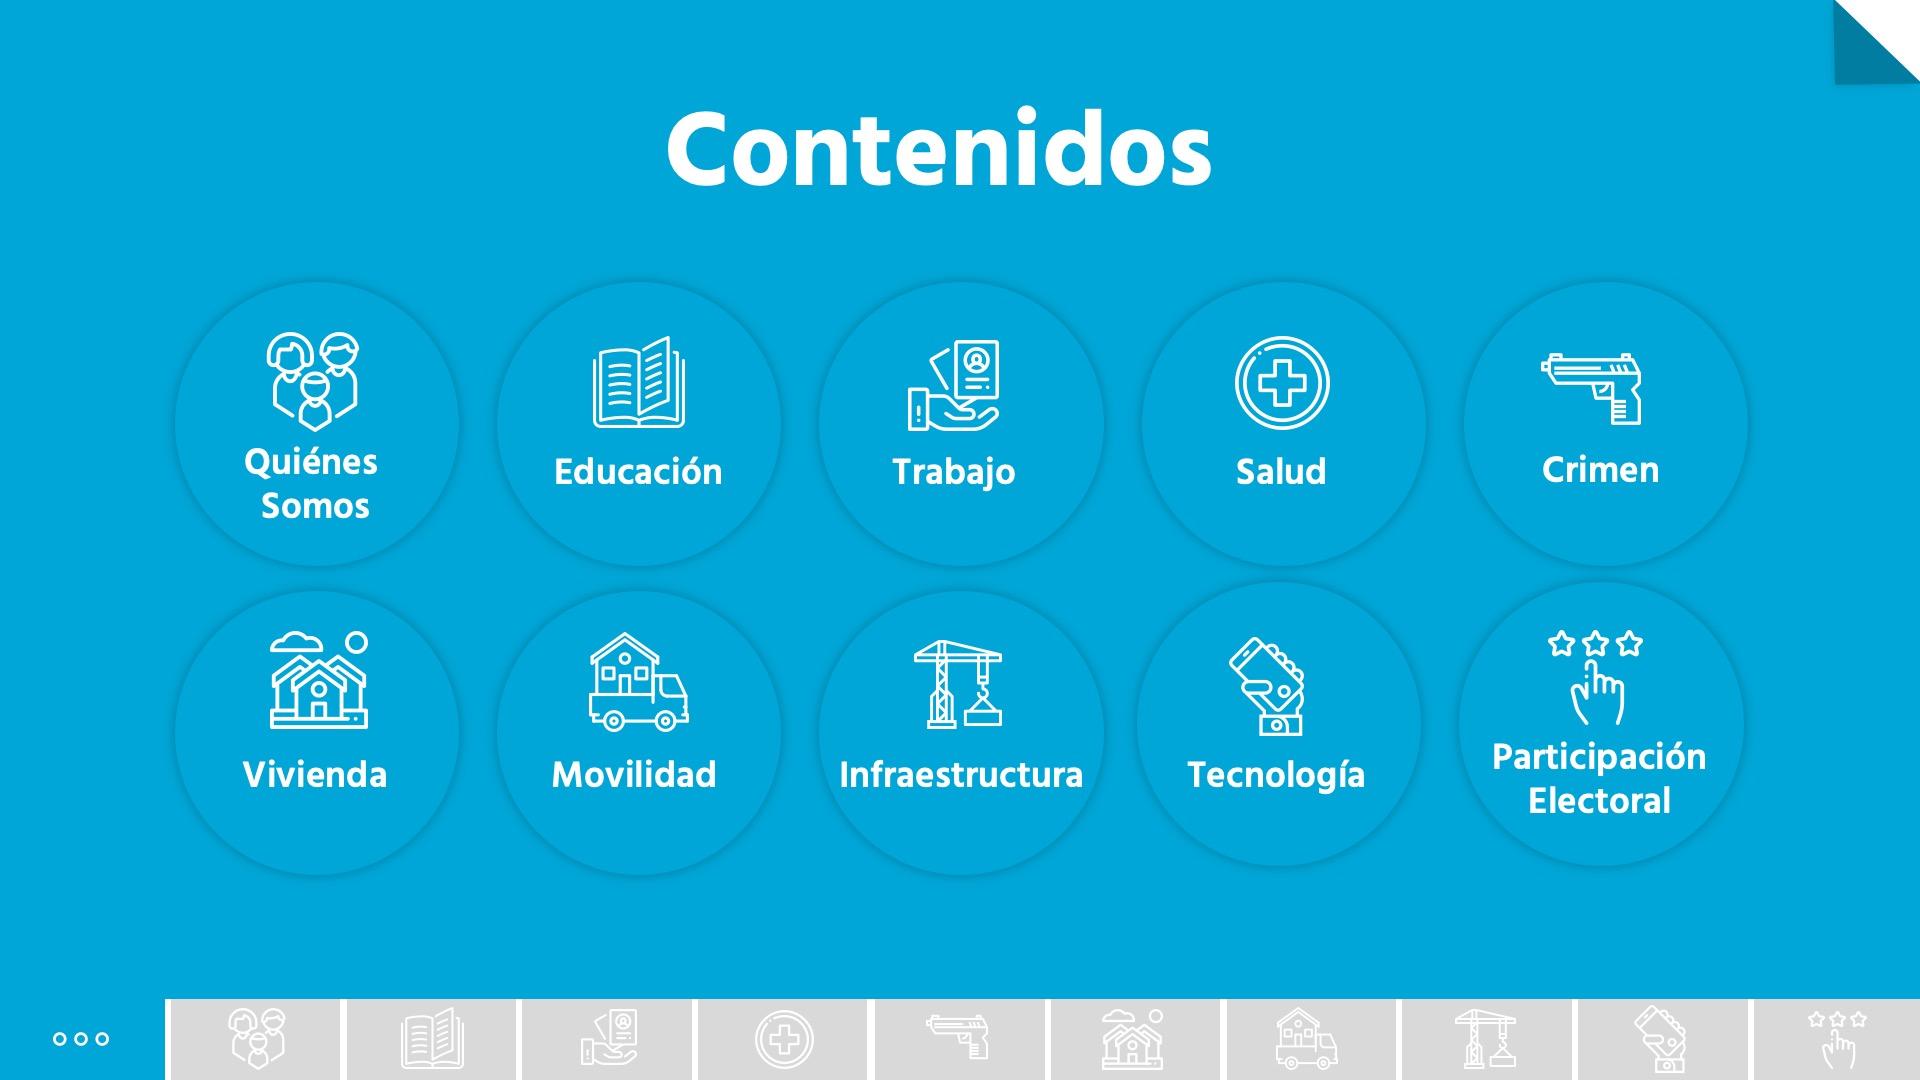 Chile_con_datos_publicos_20190328.jpg